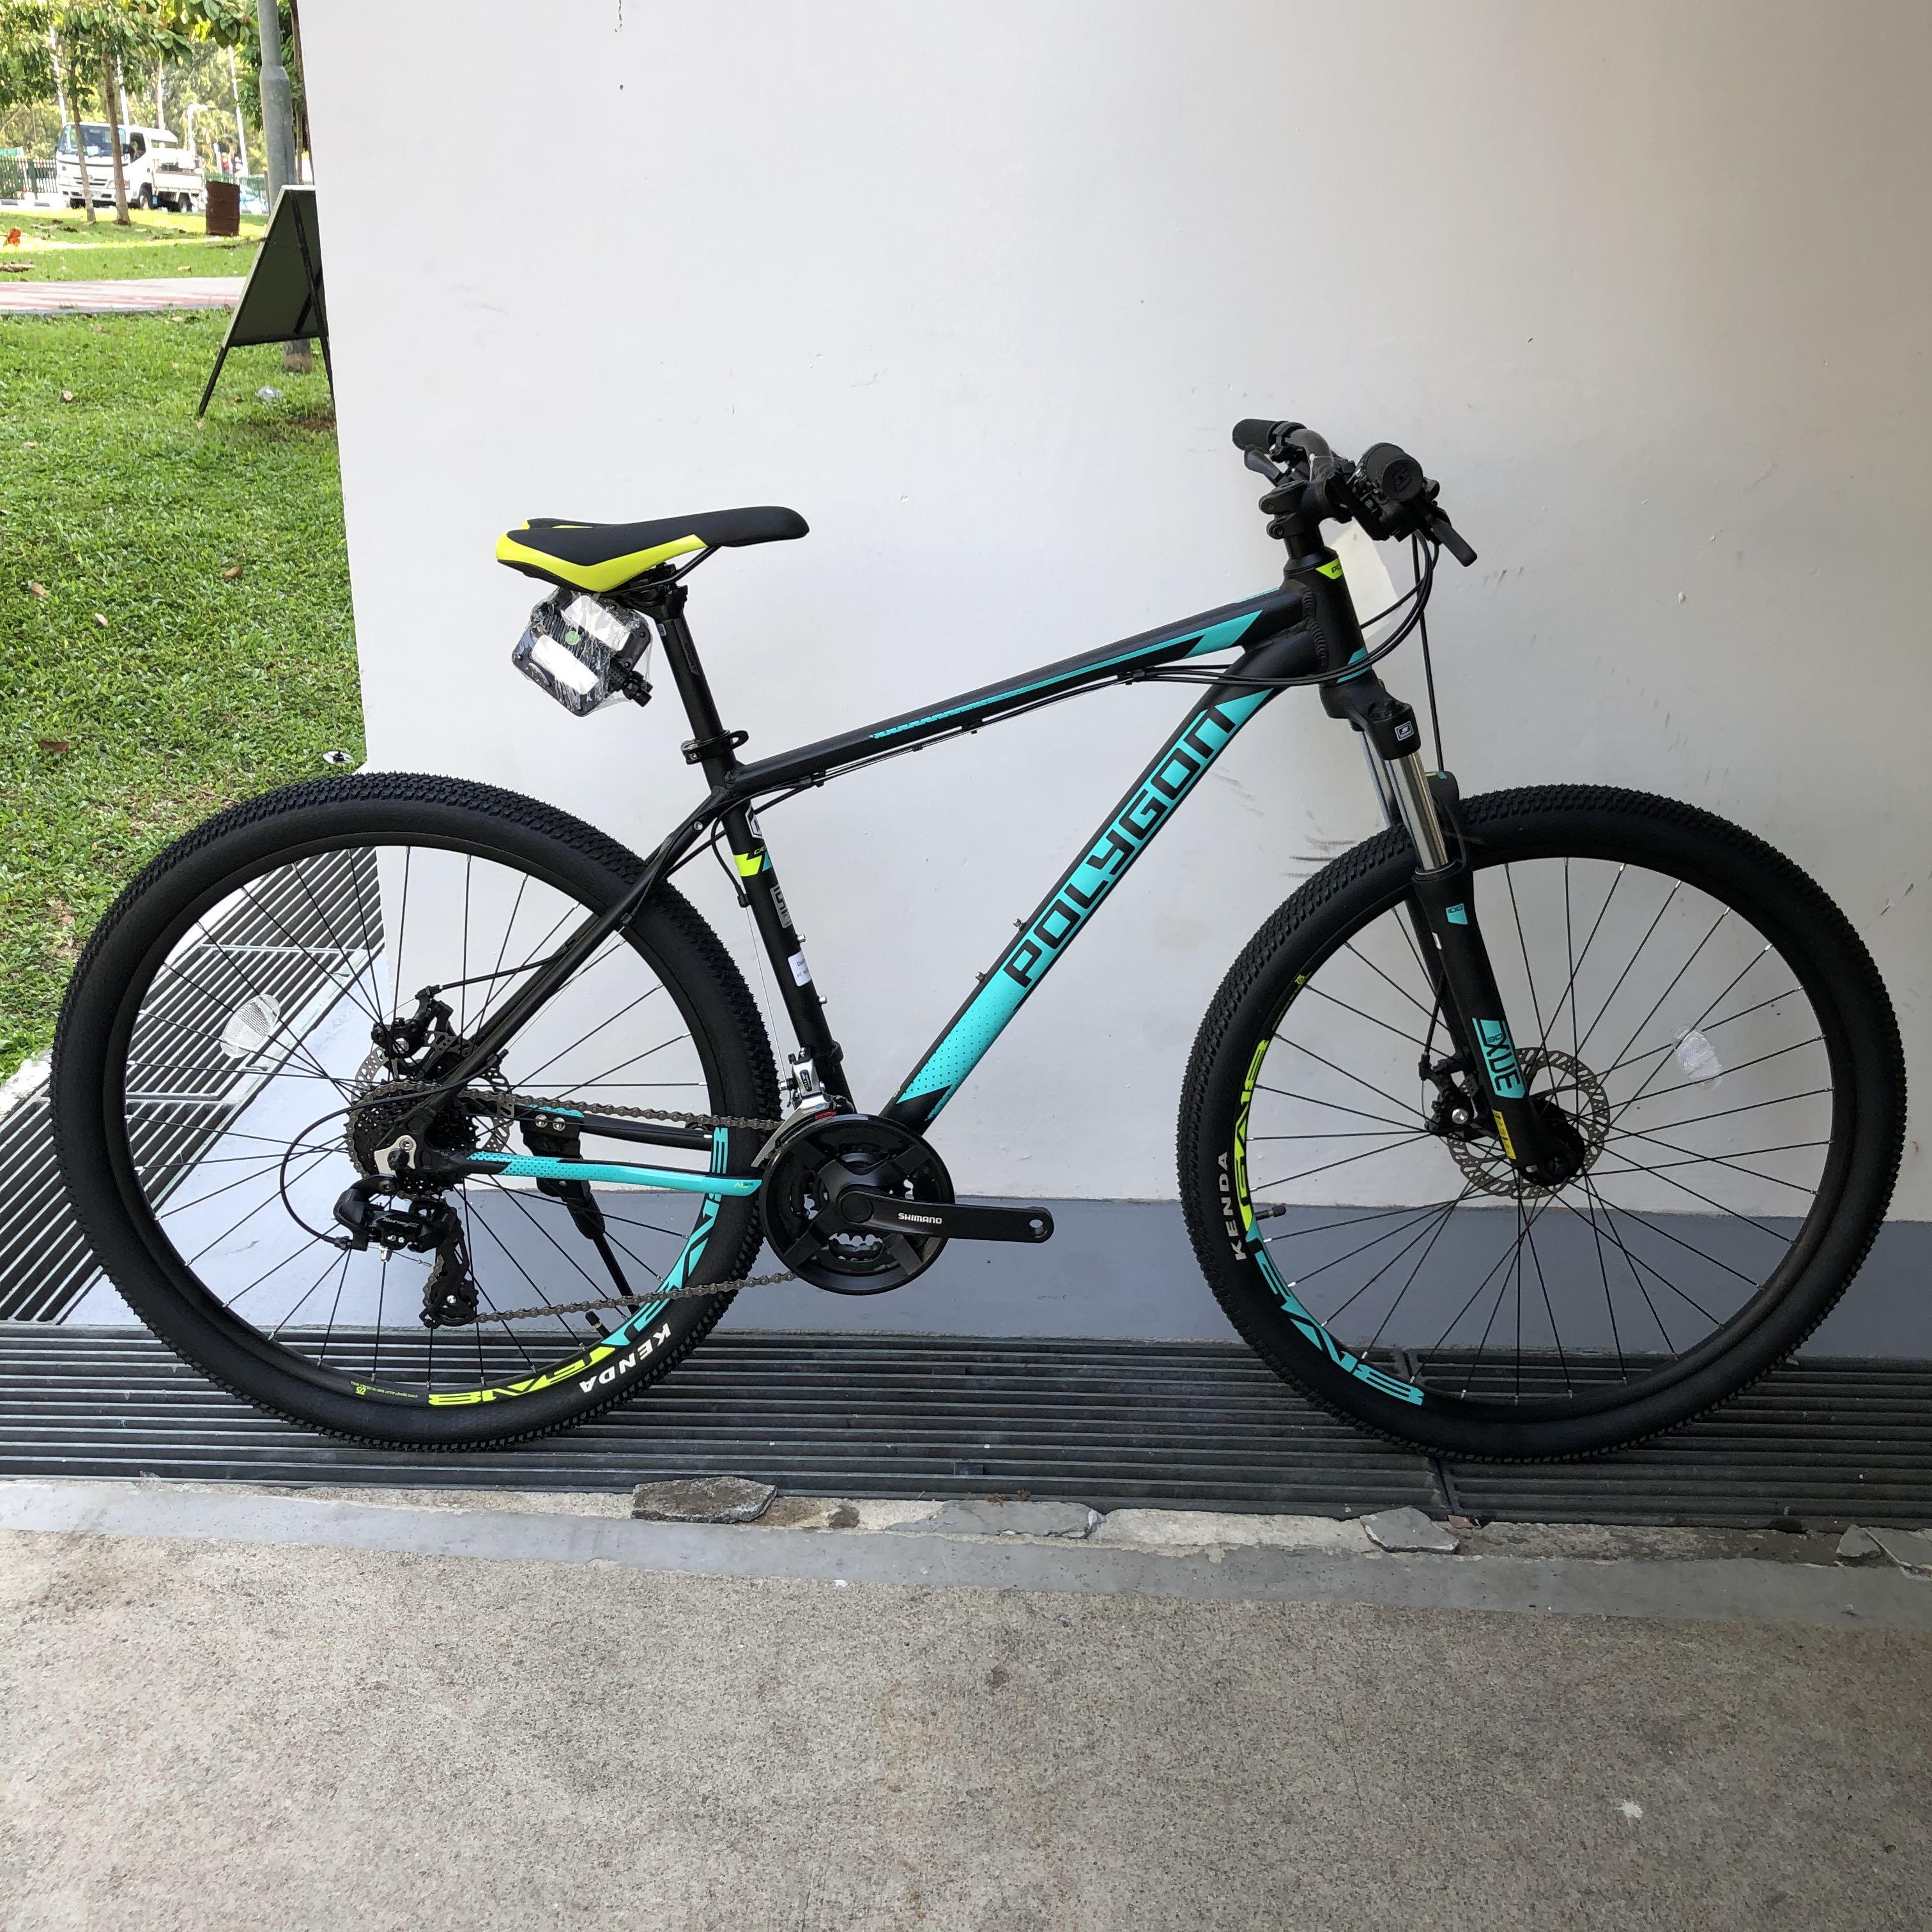 New Polygon CASCADE 4 mountain bike 27.5 medium, Bicycles